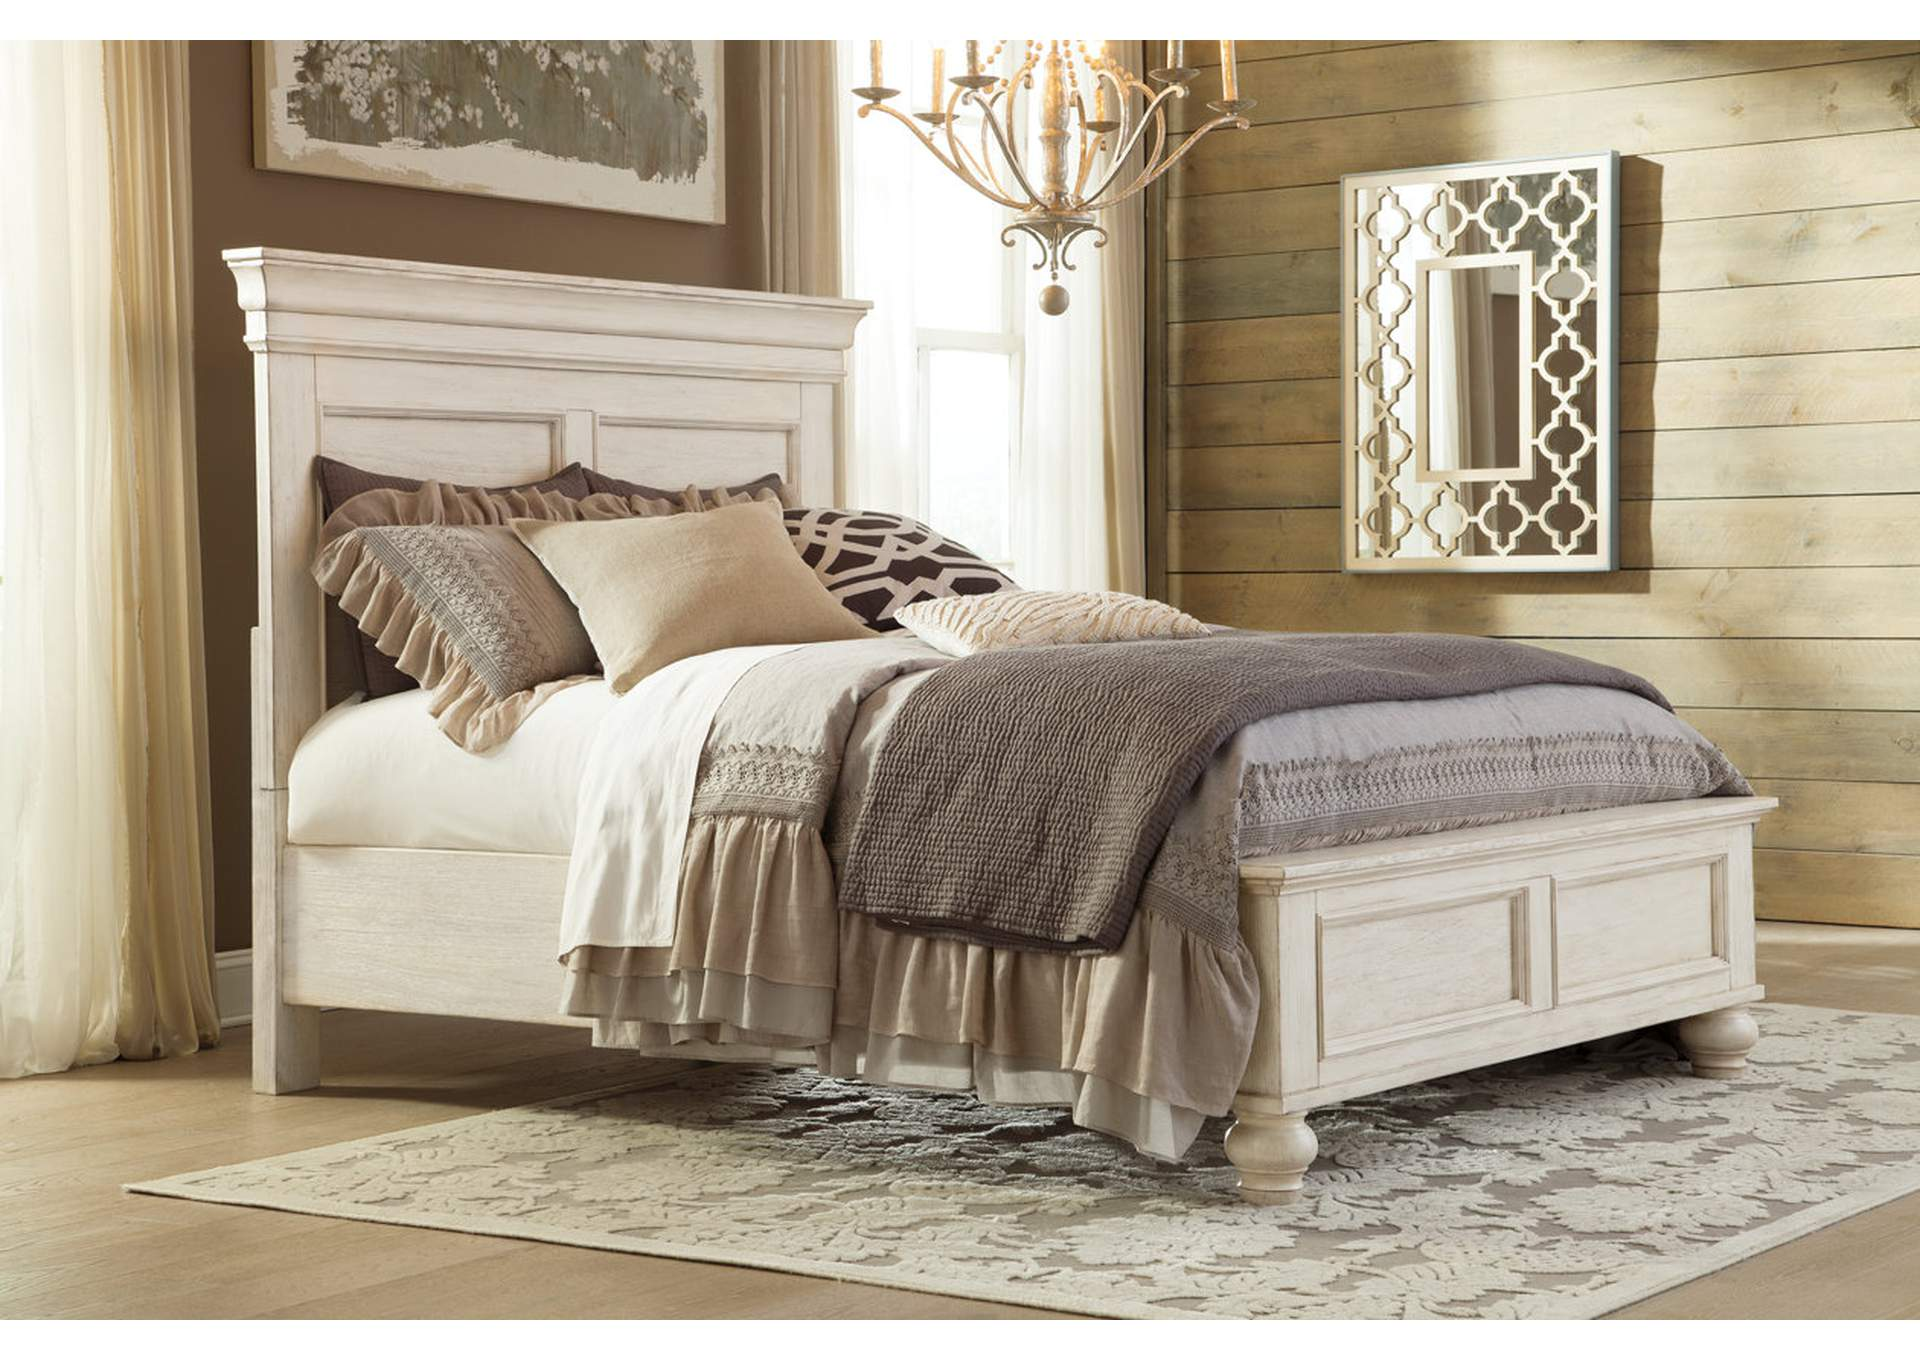 Marsilona King Panel Bed